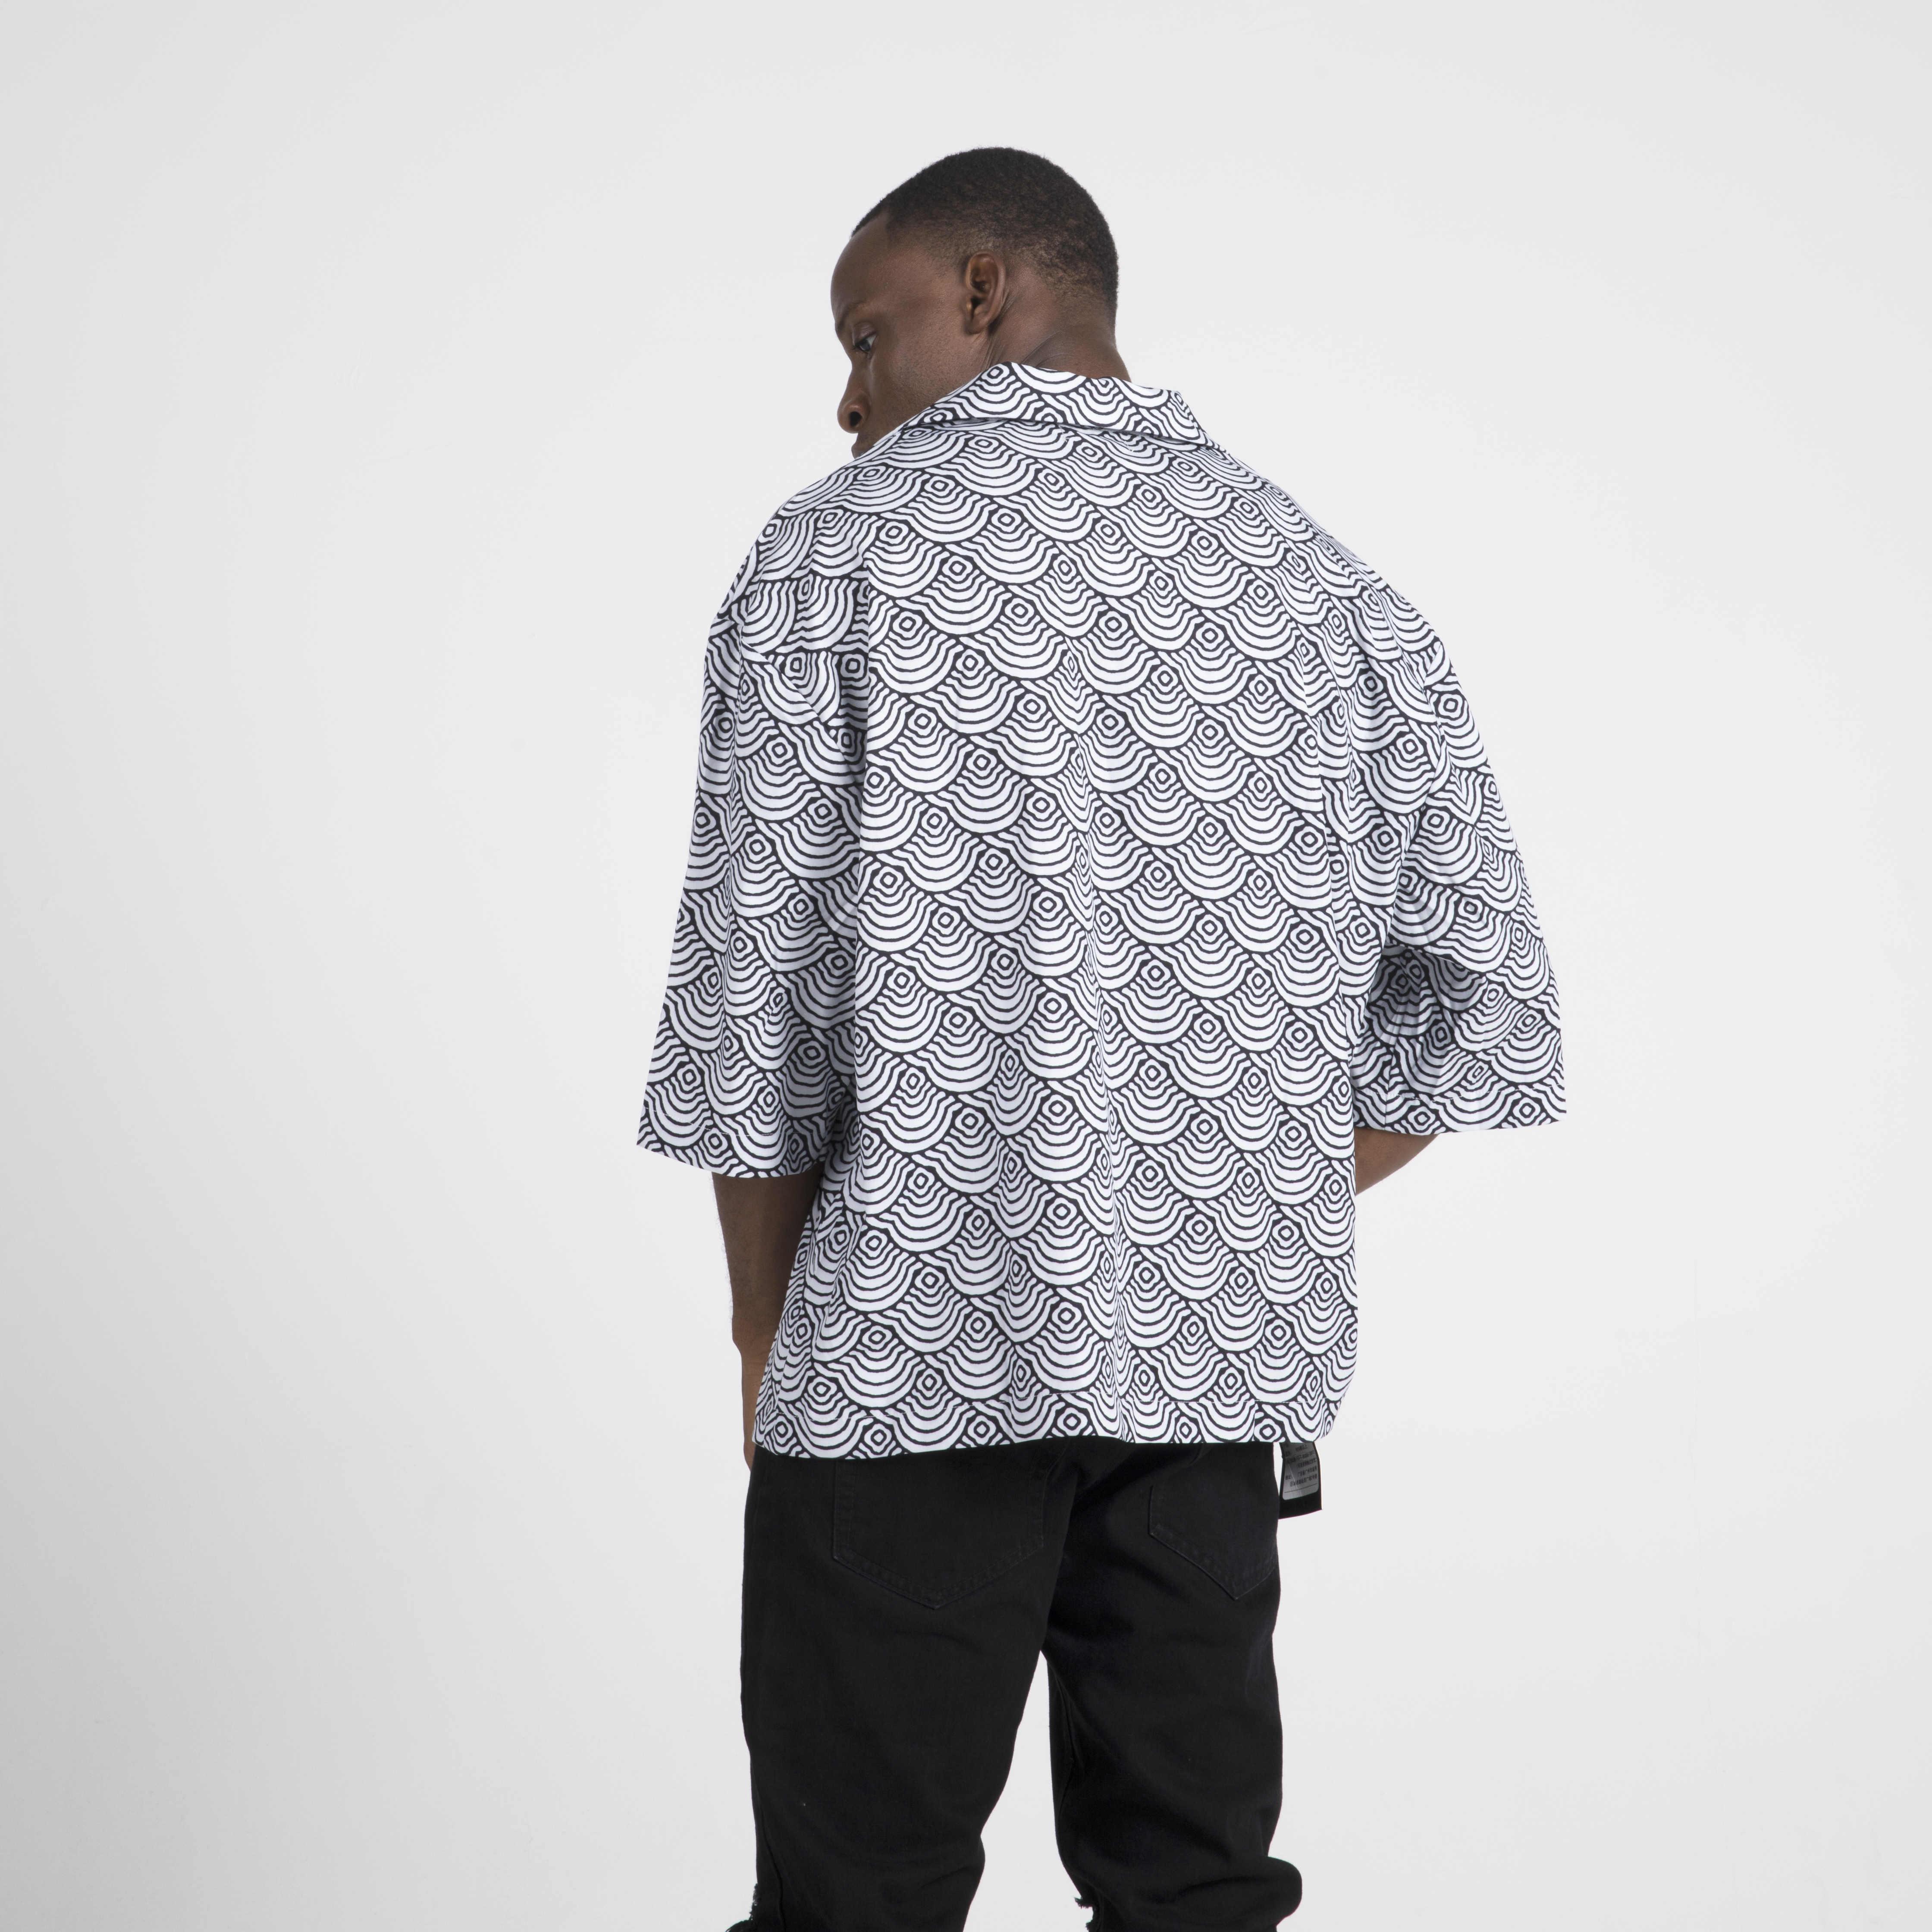 Camisas masculinas topo rua wear hiphop nova moda